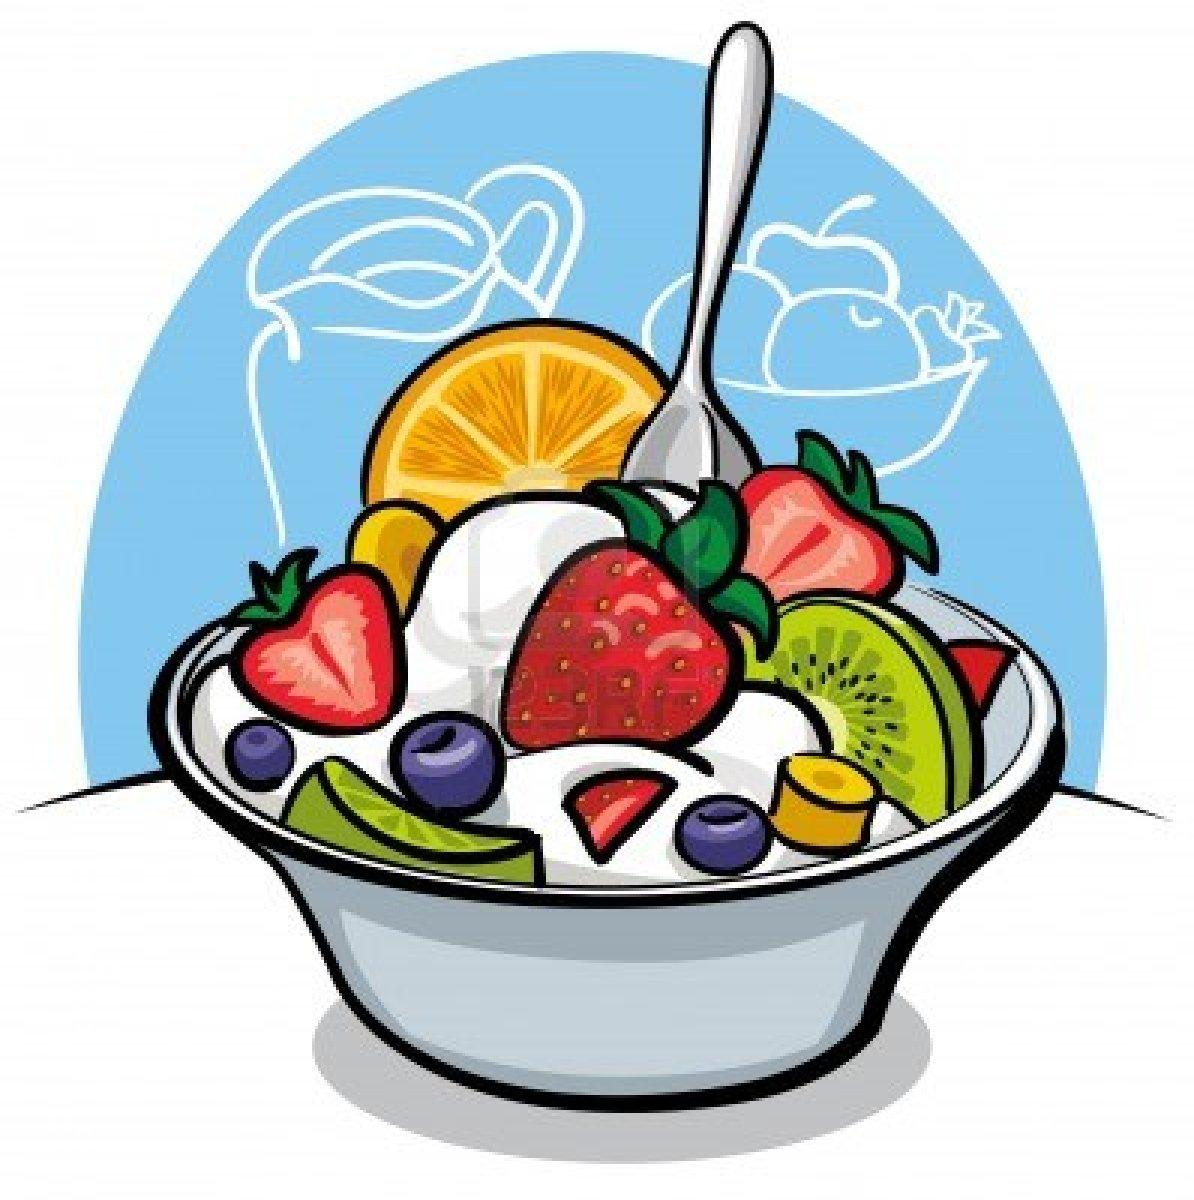 salad clip art photos free clipart panda free clipart images rh clipartpanda com Seafood Clip Art Potato Salad Clip Art